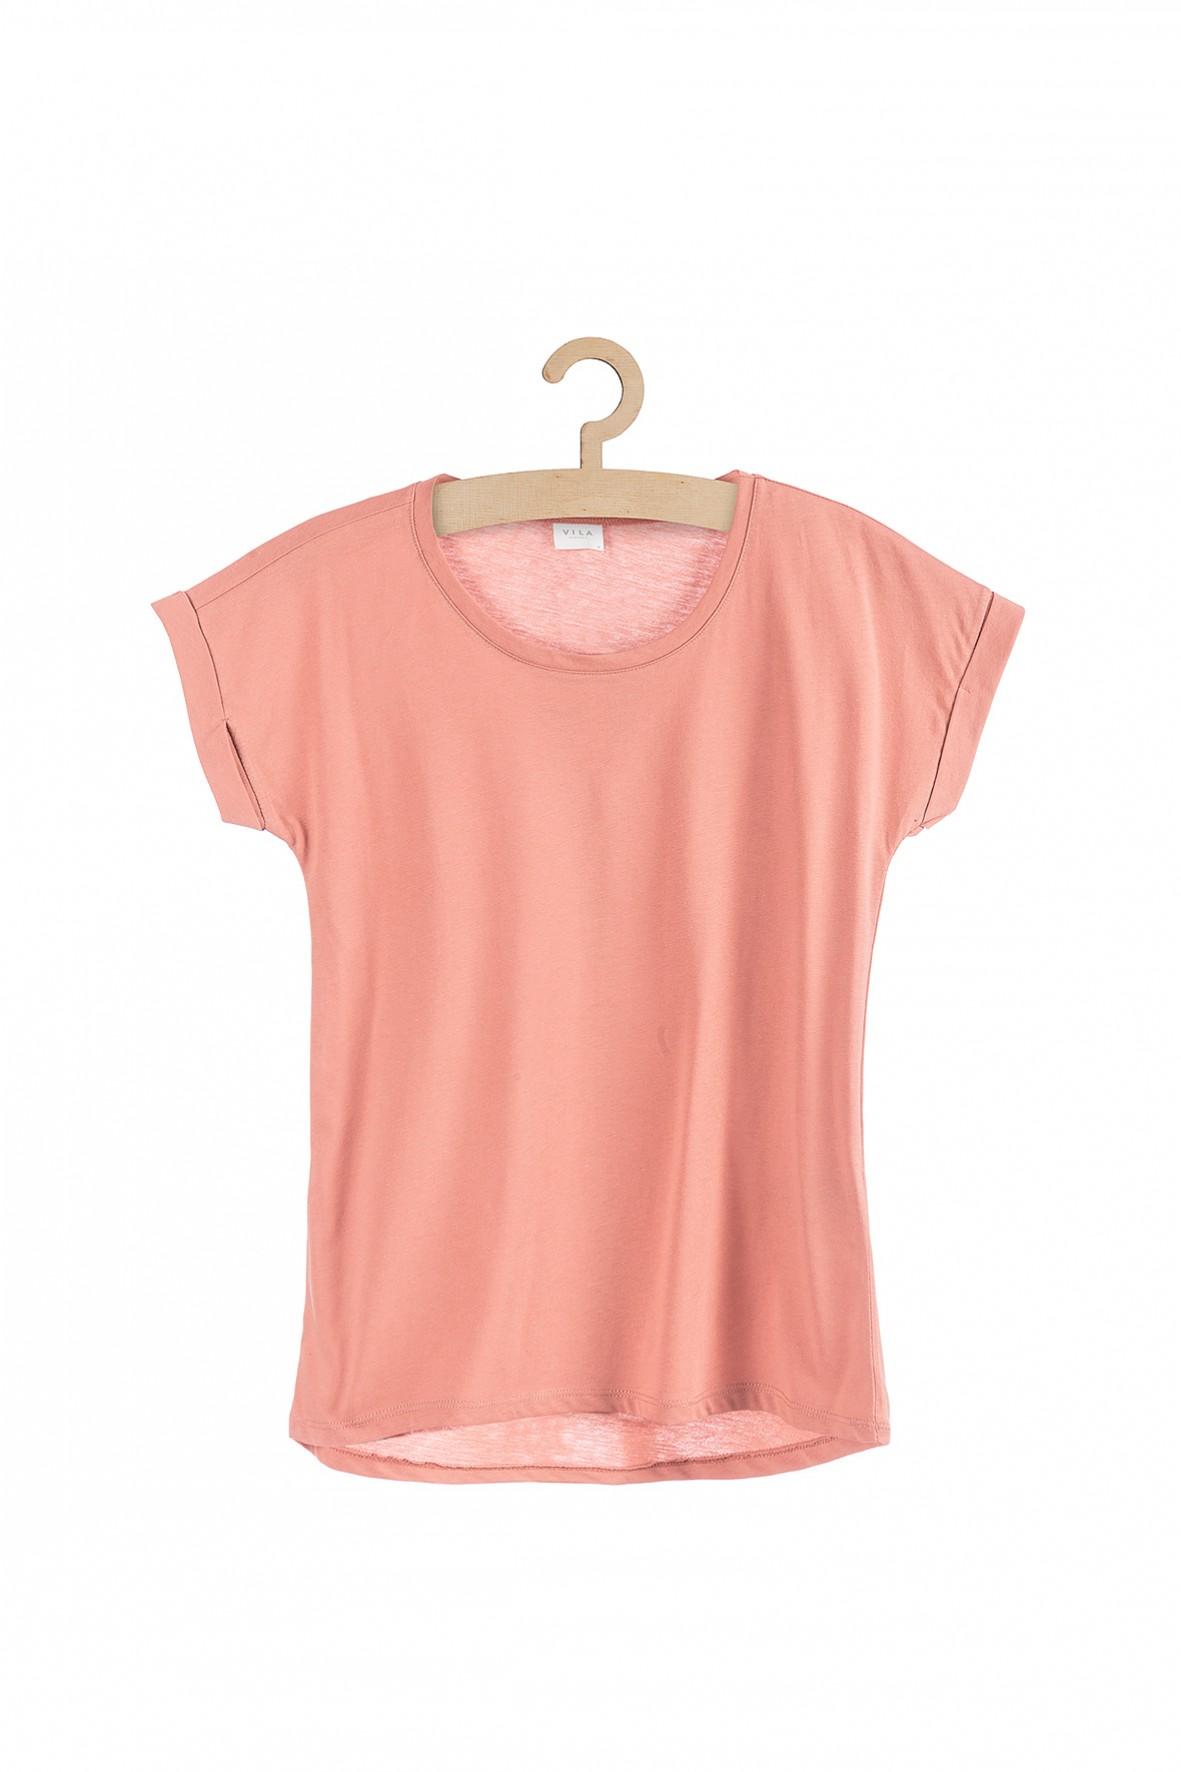 Damski t-shirt - pudrowy róż